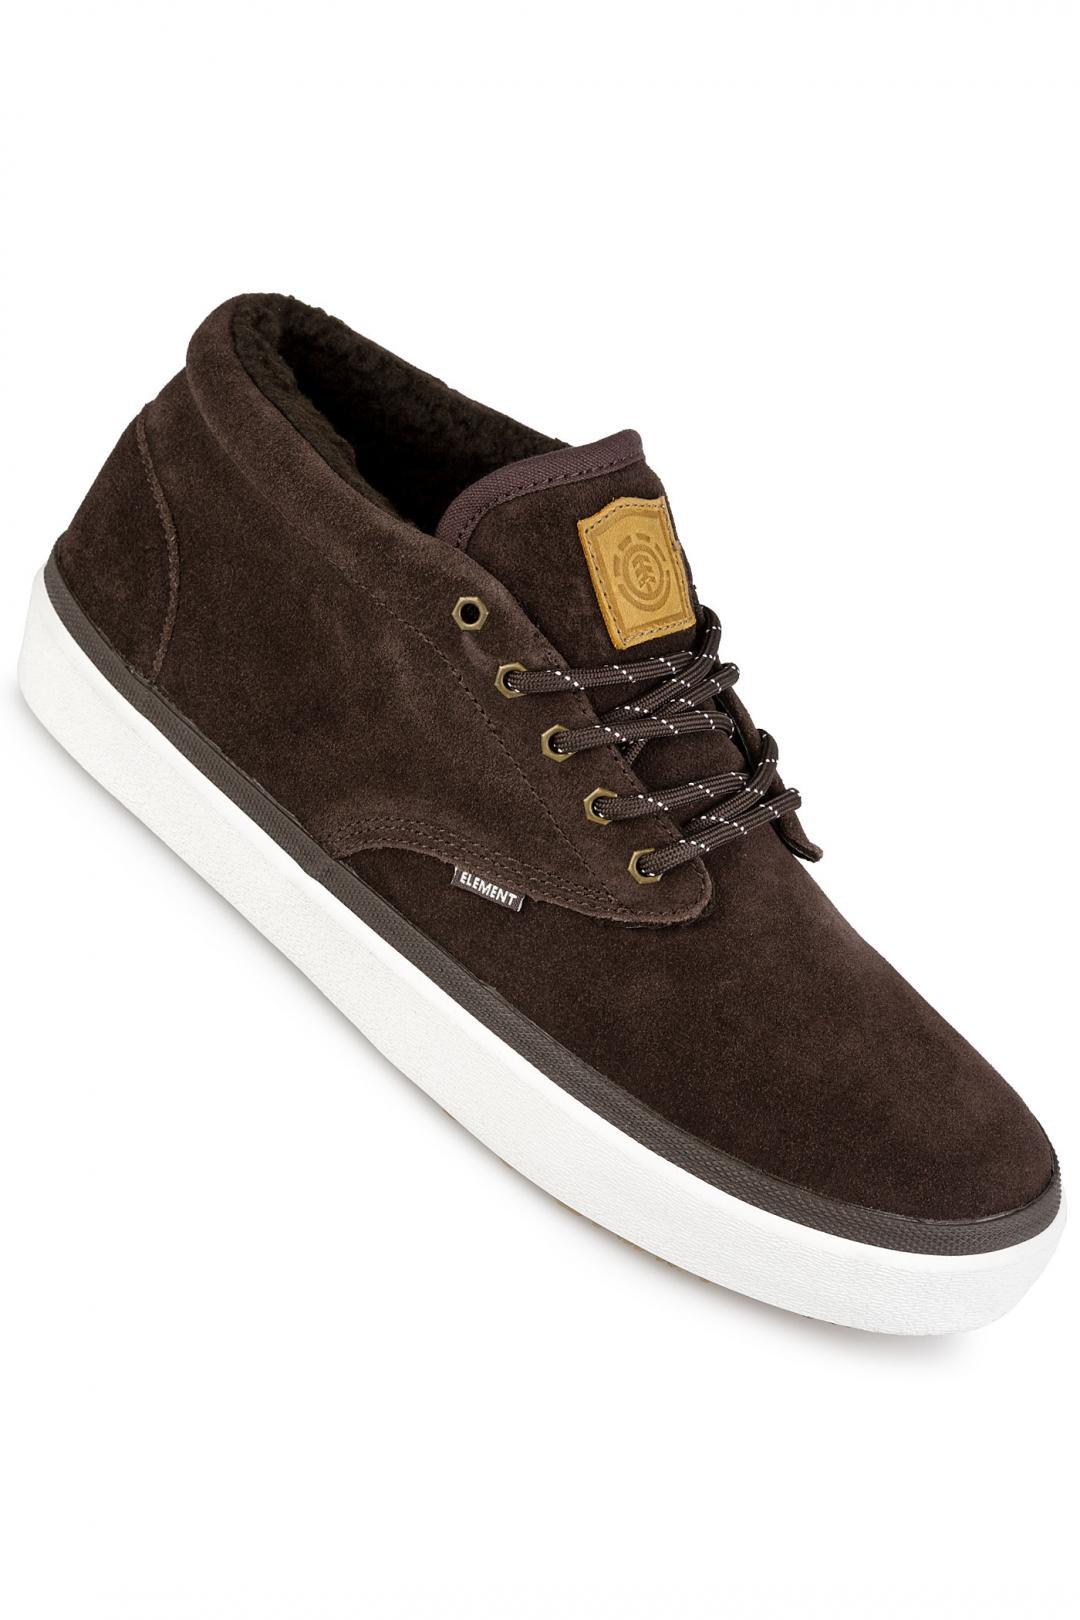 Uomo Element Preston chocolate | Sneakers mid top